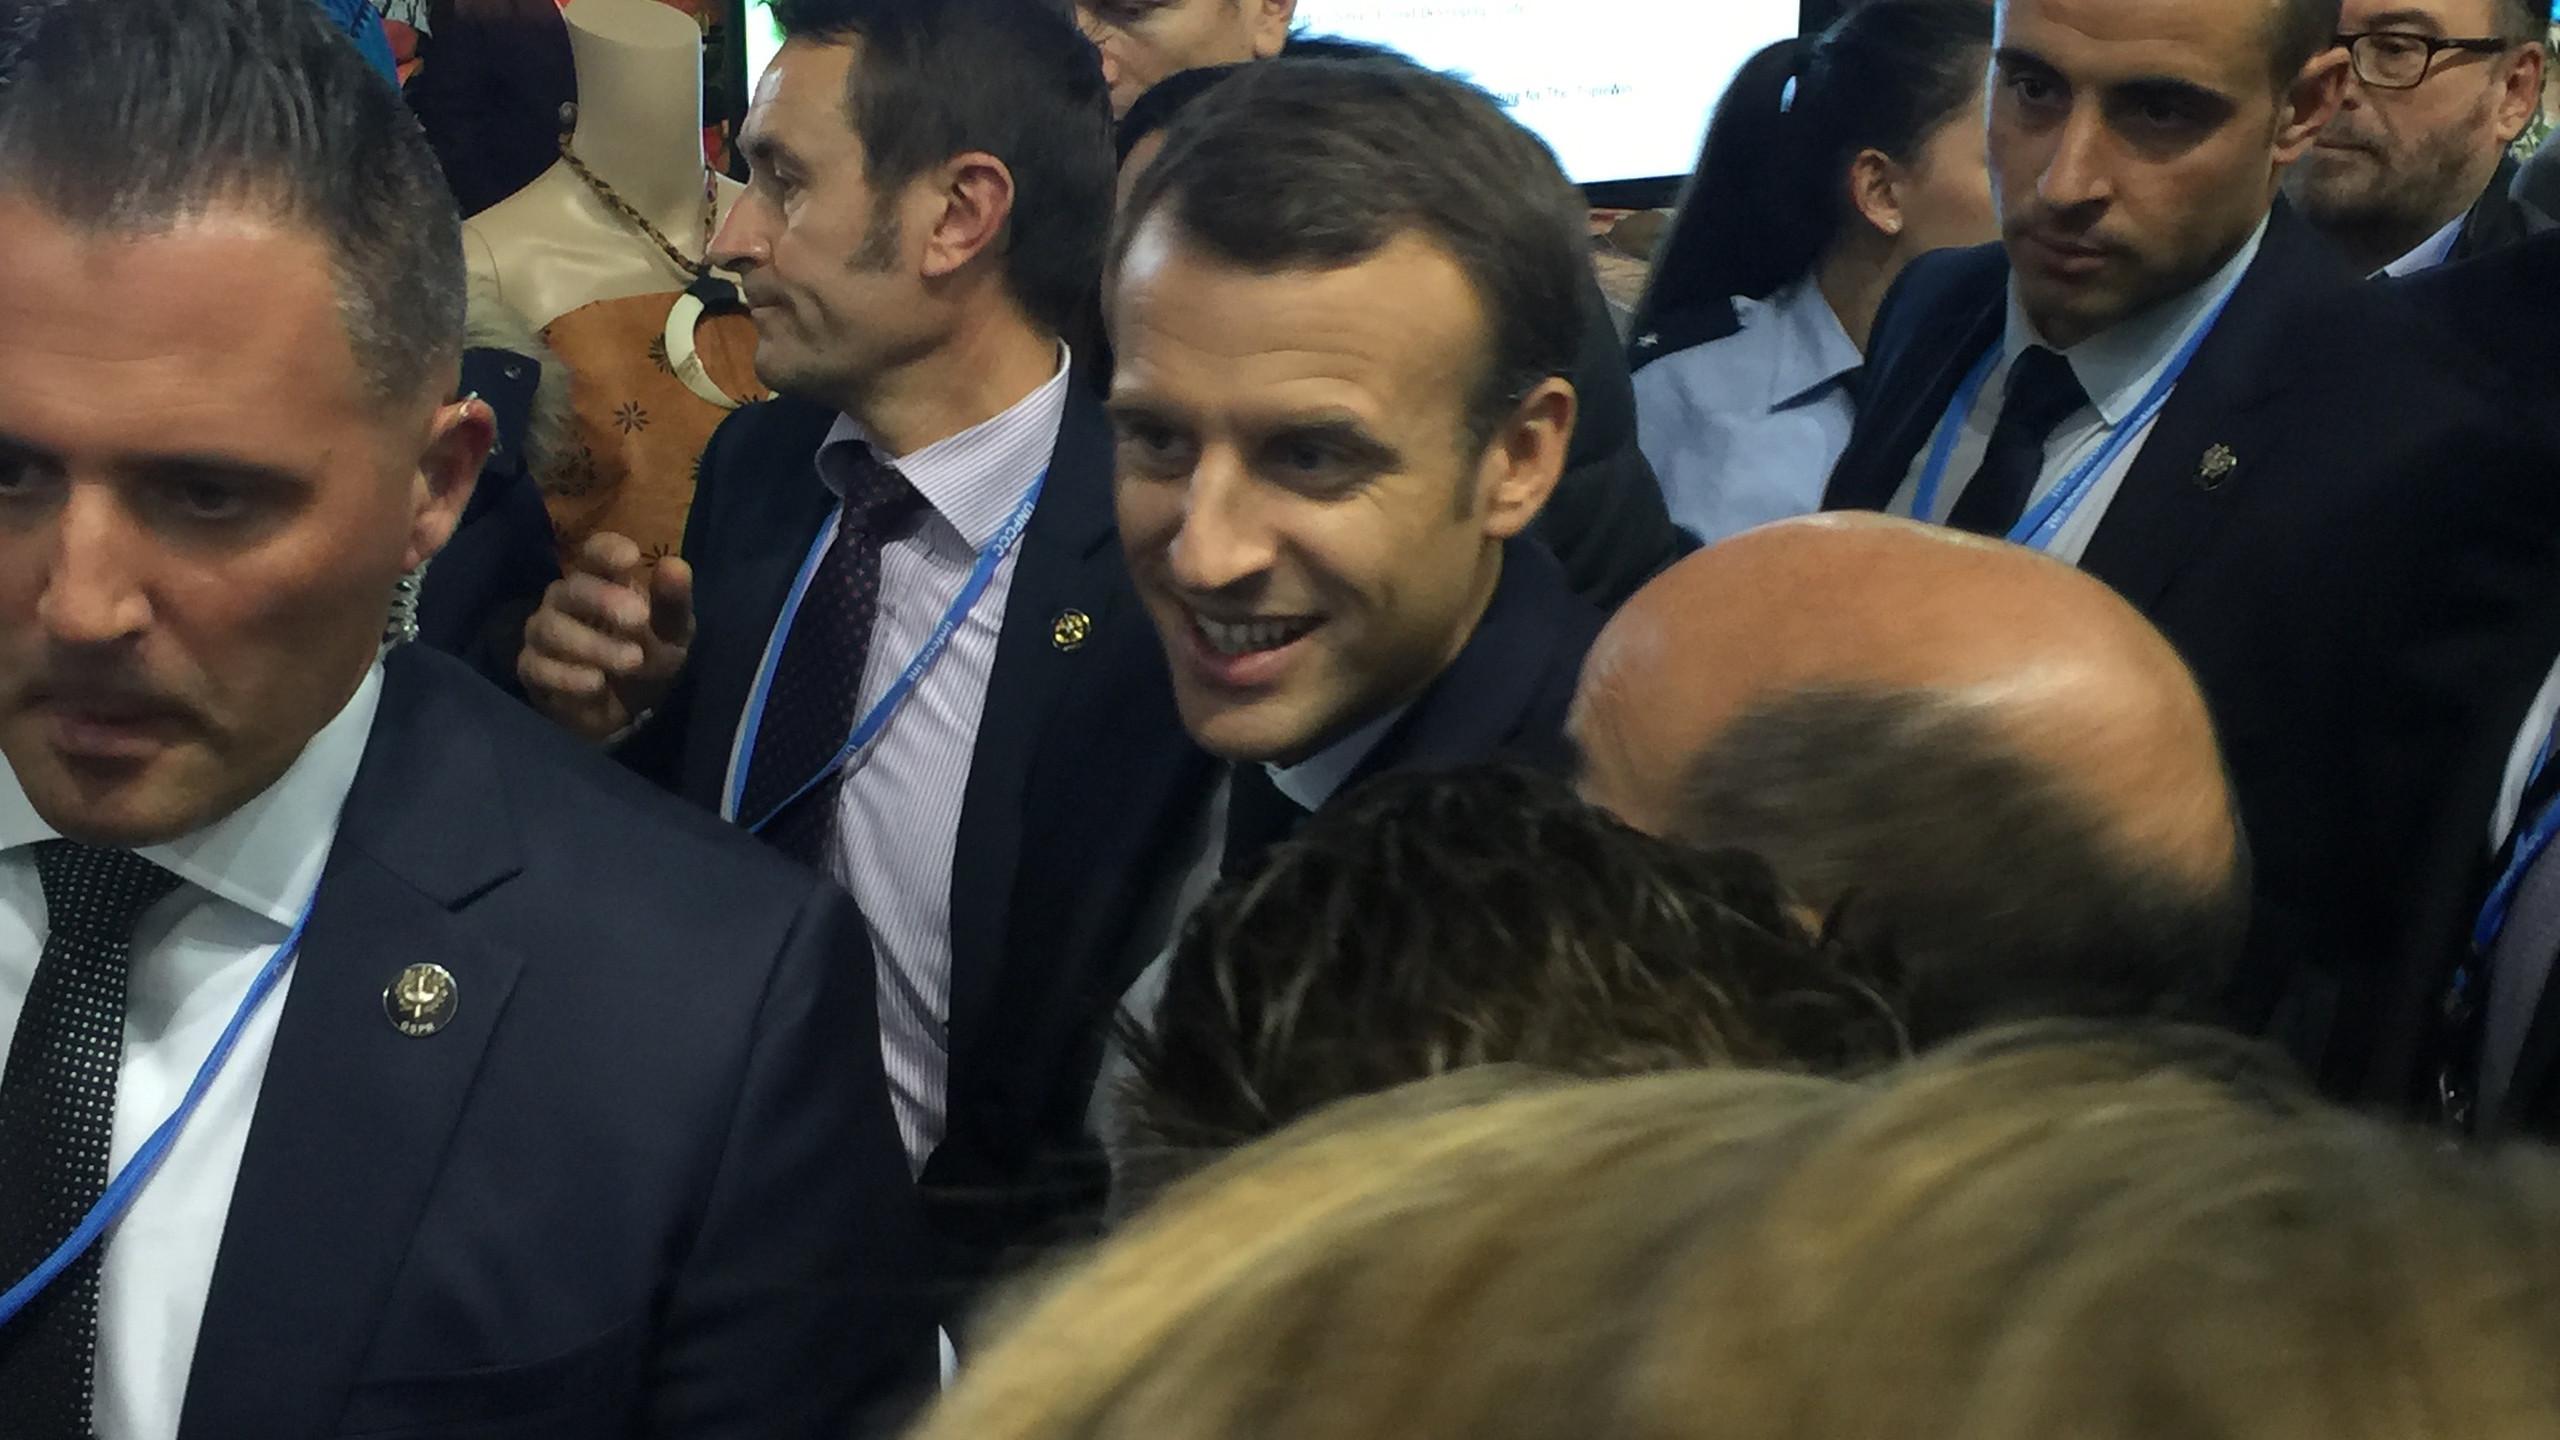 Emmanuel Macron, President of France